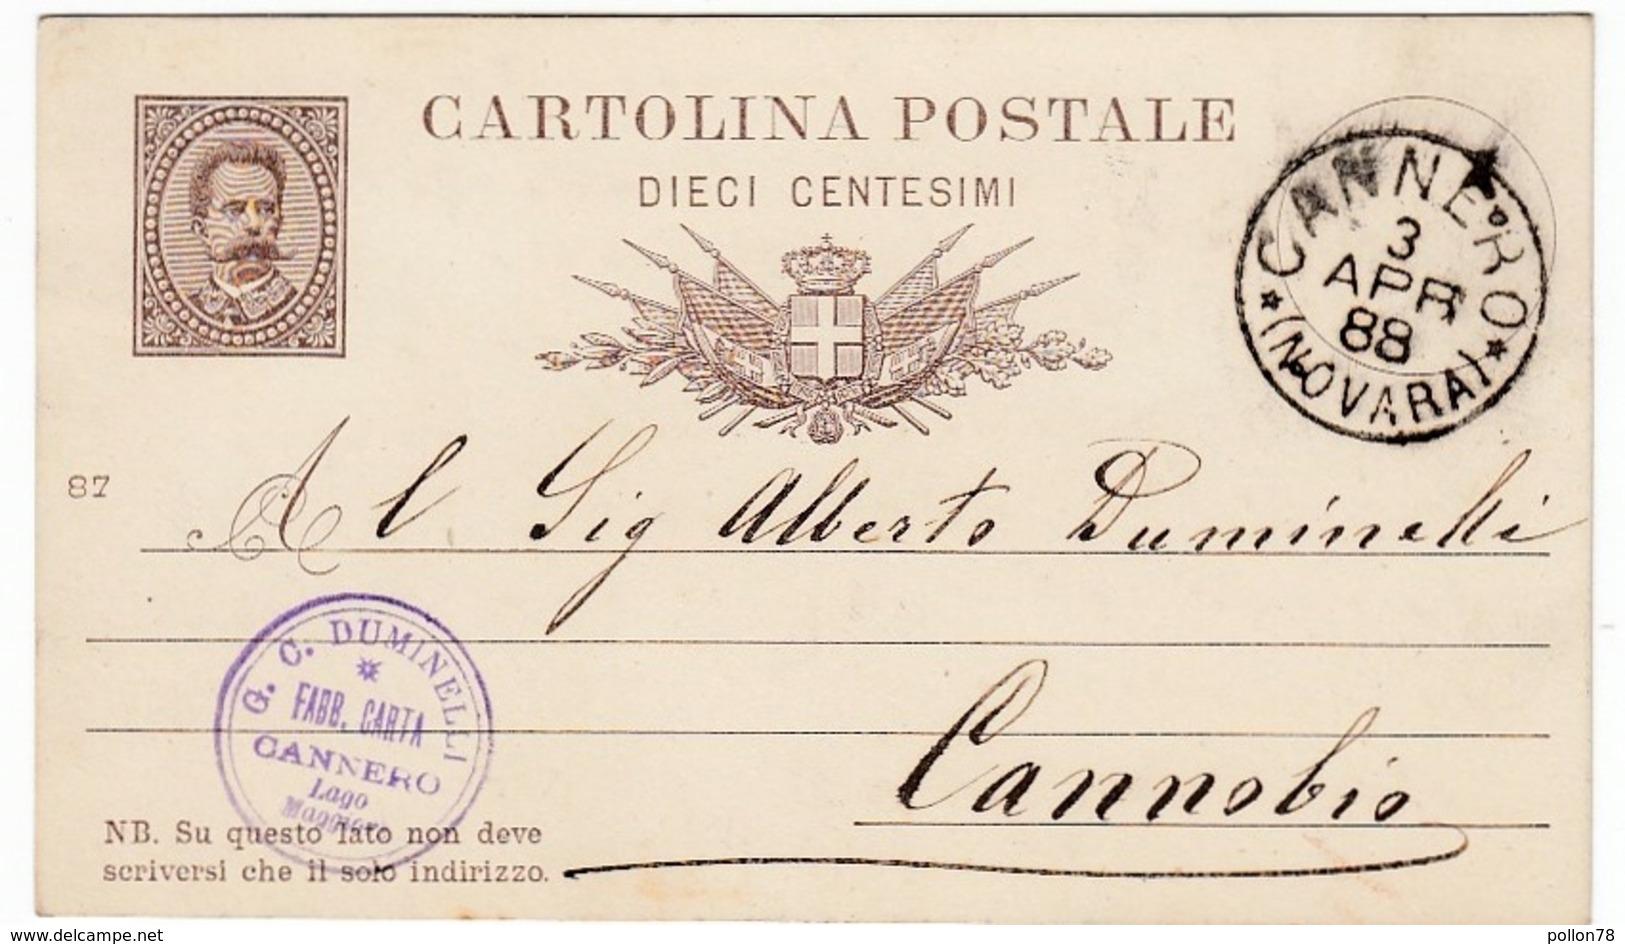 CARTOLINA POSTALE - DIECI CENTESIMI - TIMBRO CANNERO - NOVARA - 1888 - VERBANIA - Francobolli (rappresentazioni)